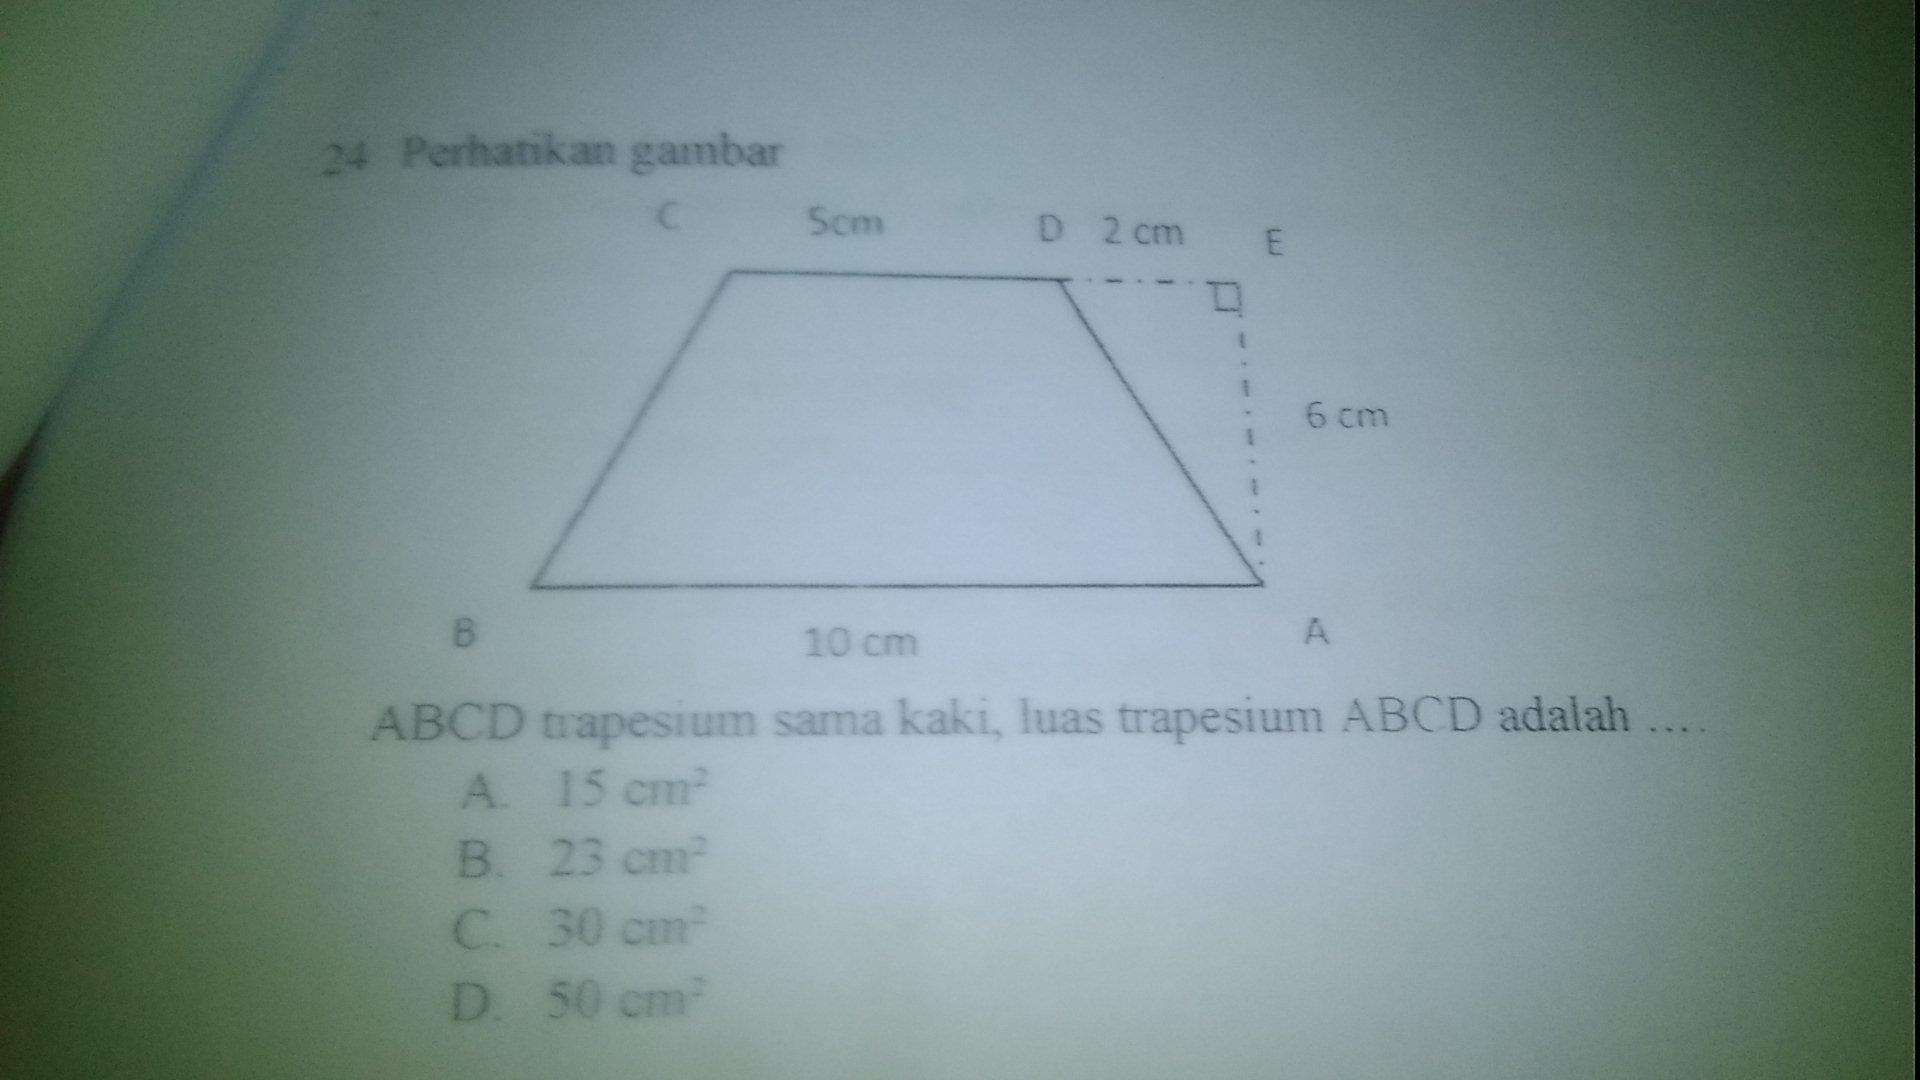 Abcd Trapesium Sama Kaki Luas Trapesium Abcd Adalah Brainly Co Id